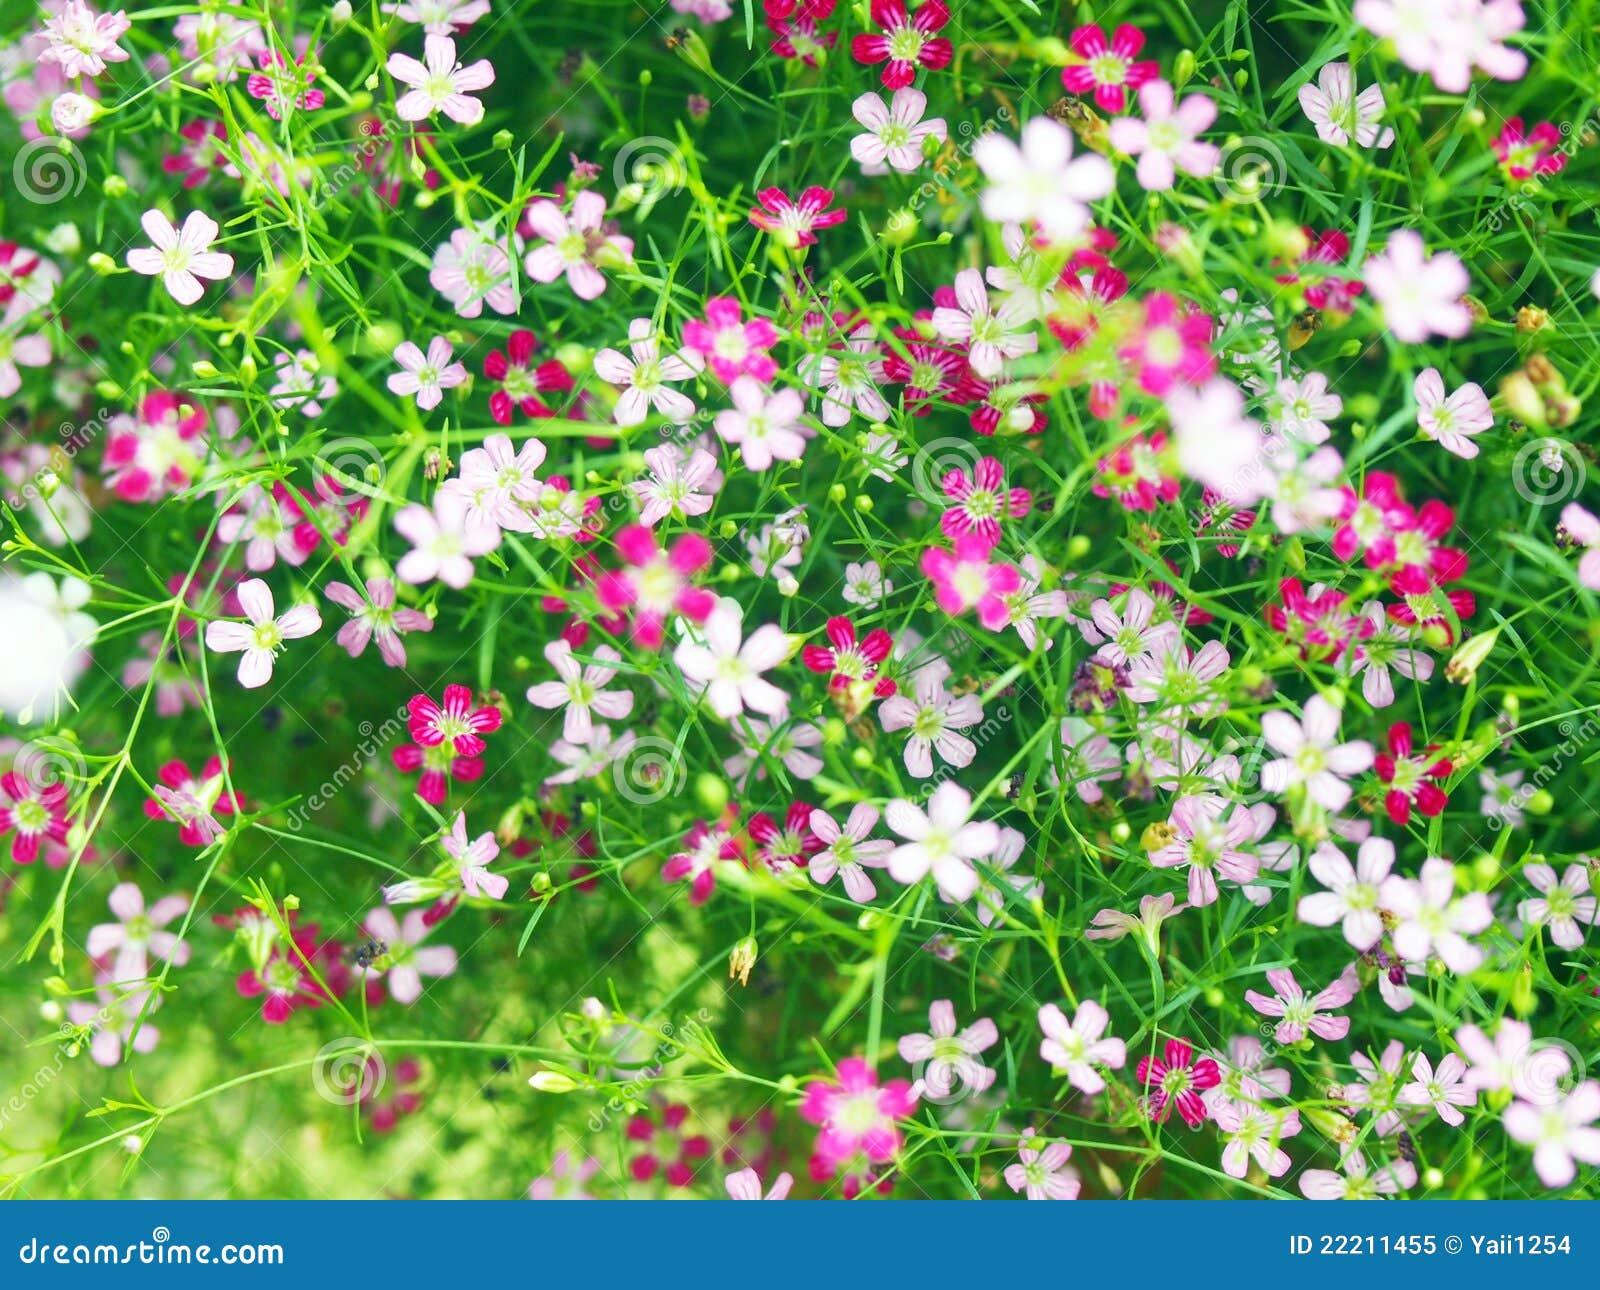 Fundo De Flores Pequenas Foto De Stock Royalty Free